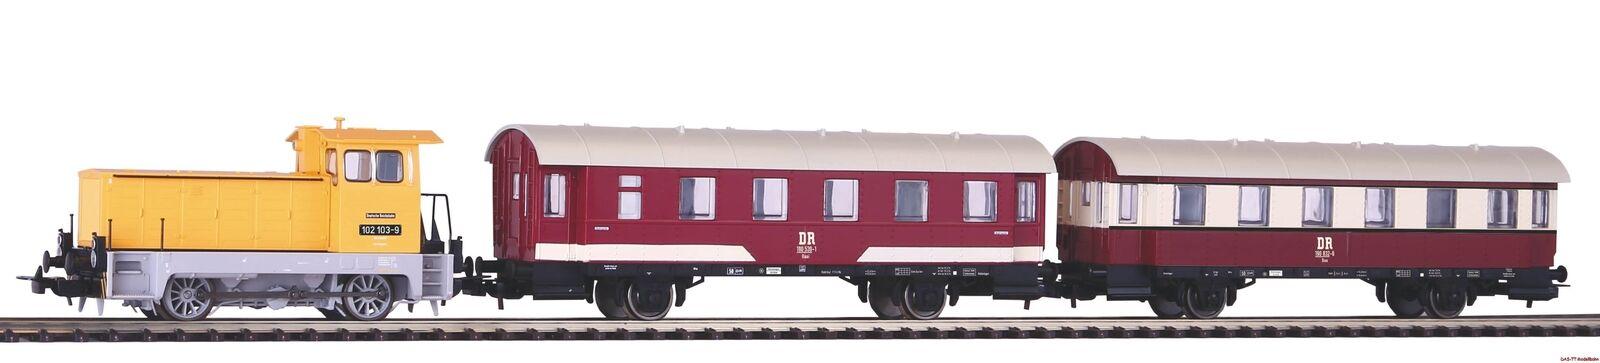 H0 Piko Zugset transport br102.1 + 2 Passenger Car DR Ep. IV PIKO 58135